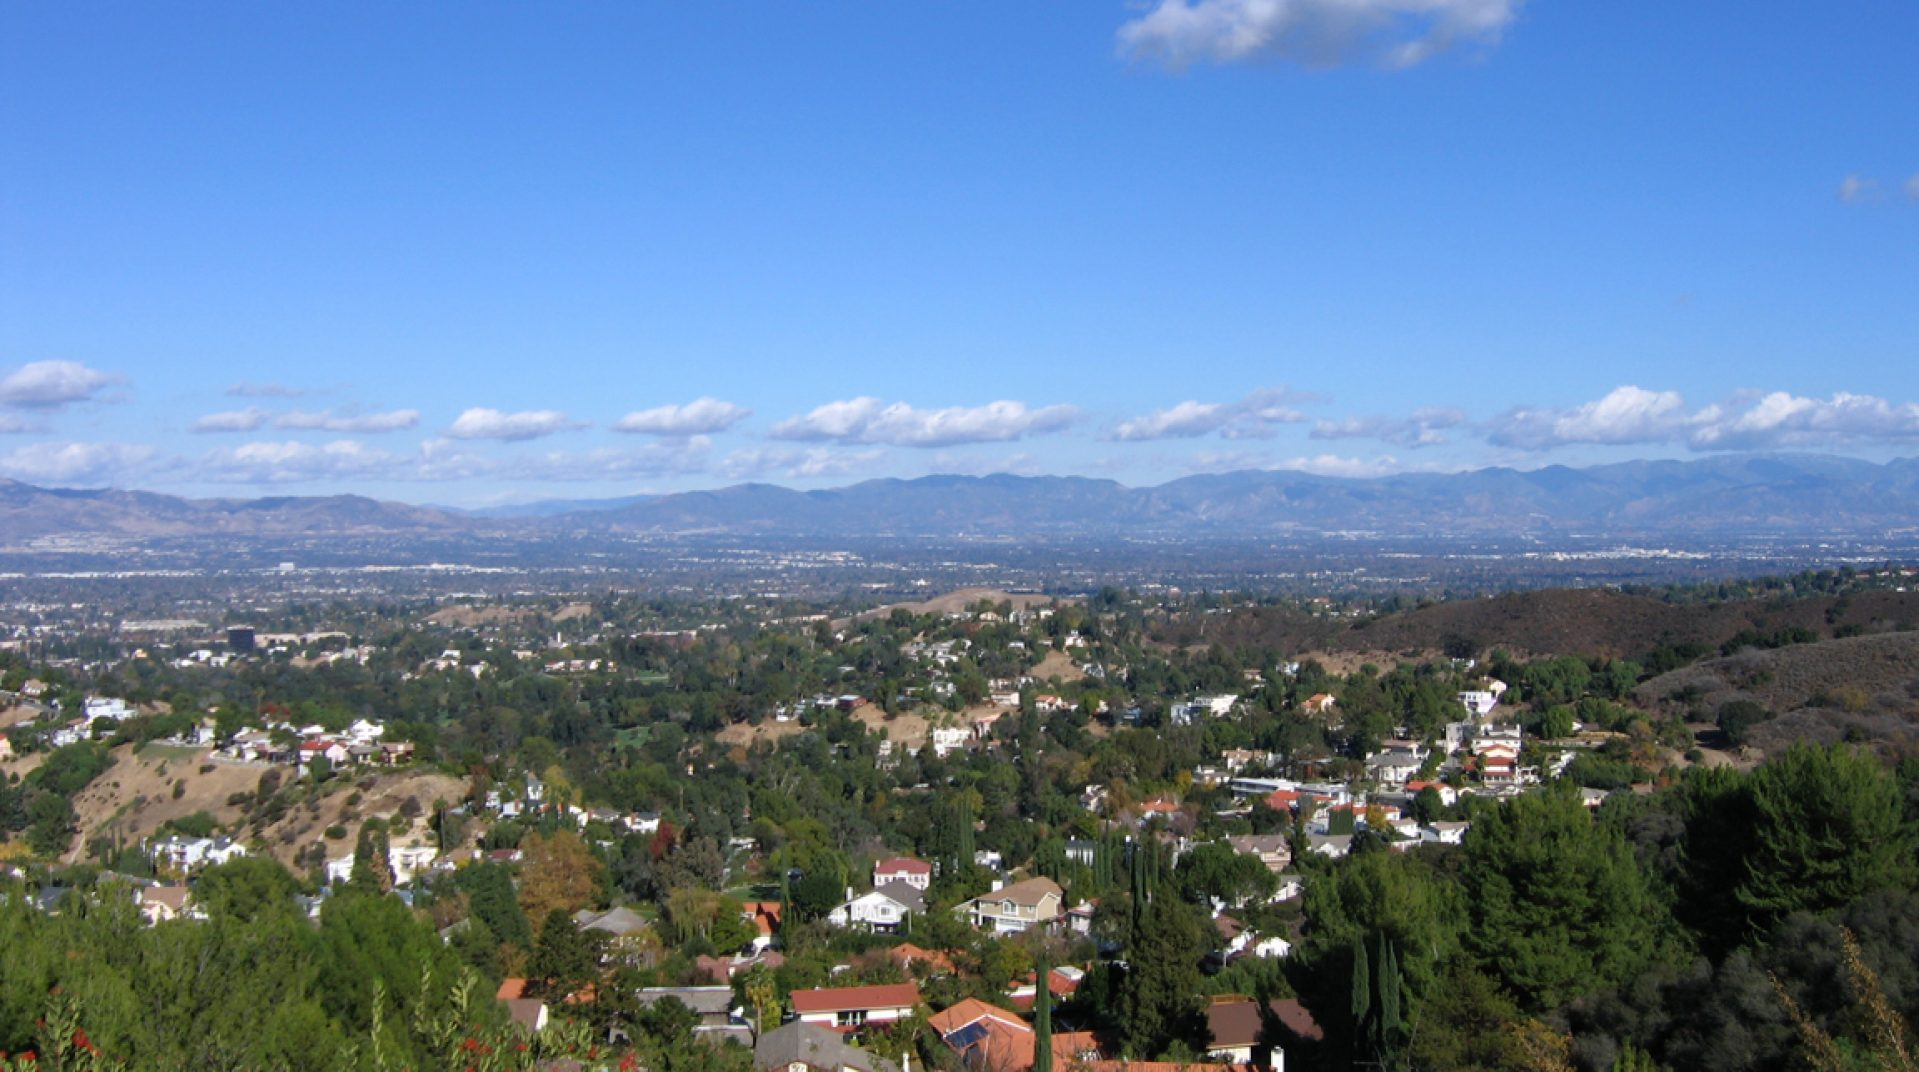 Aerial photo of community